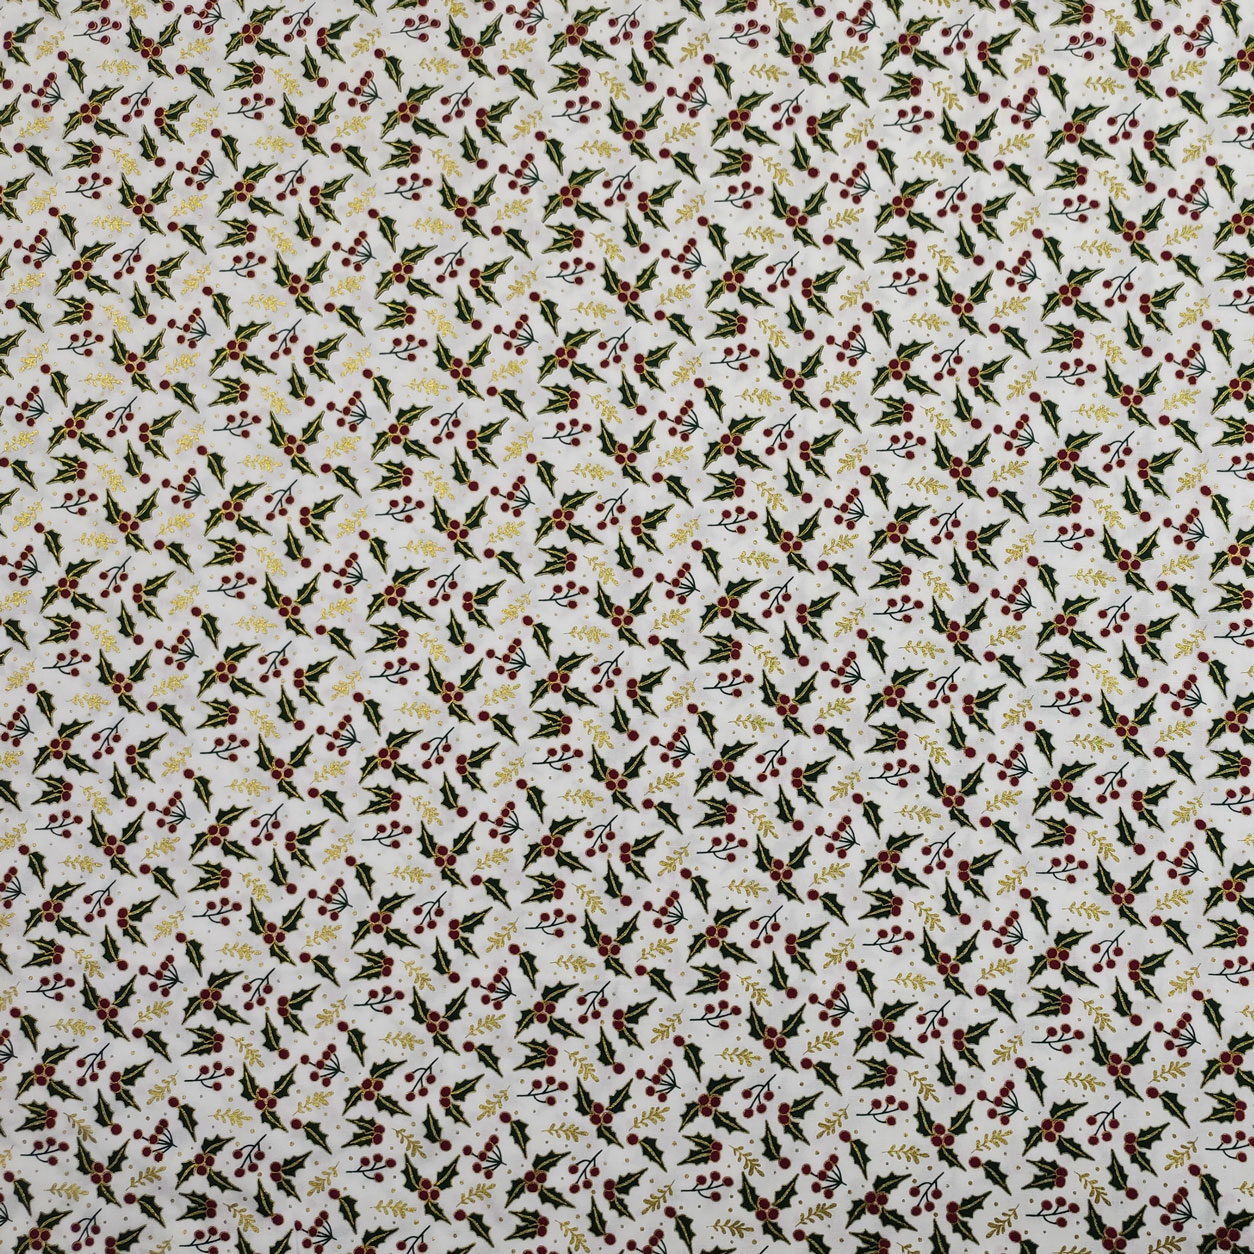 Tessuto Cotone Lurex Natalizio Agrifoglio